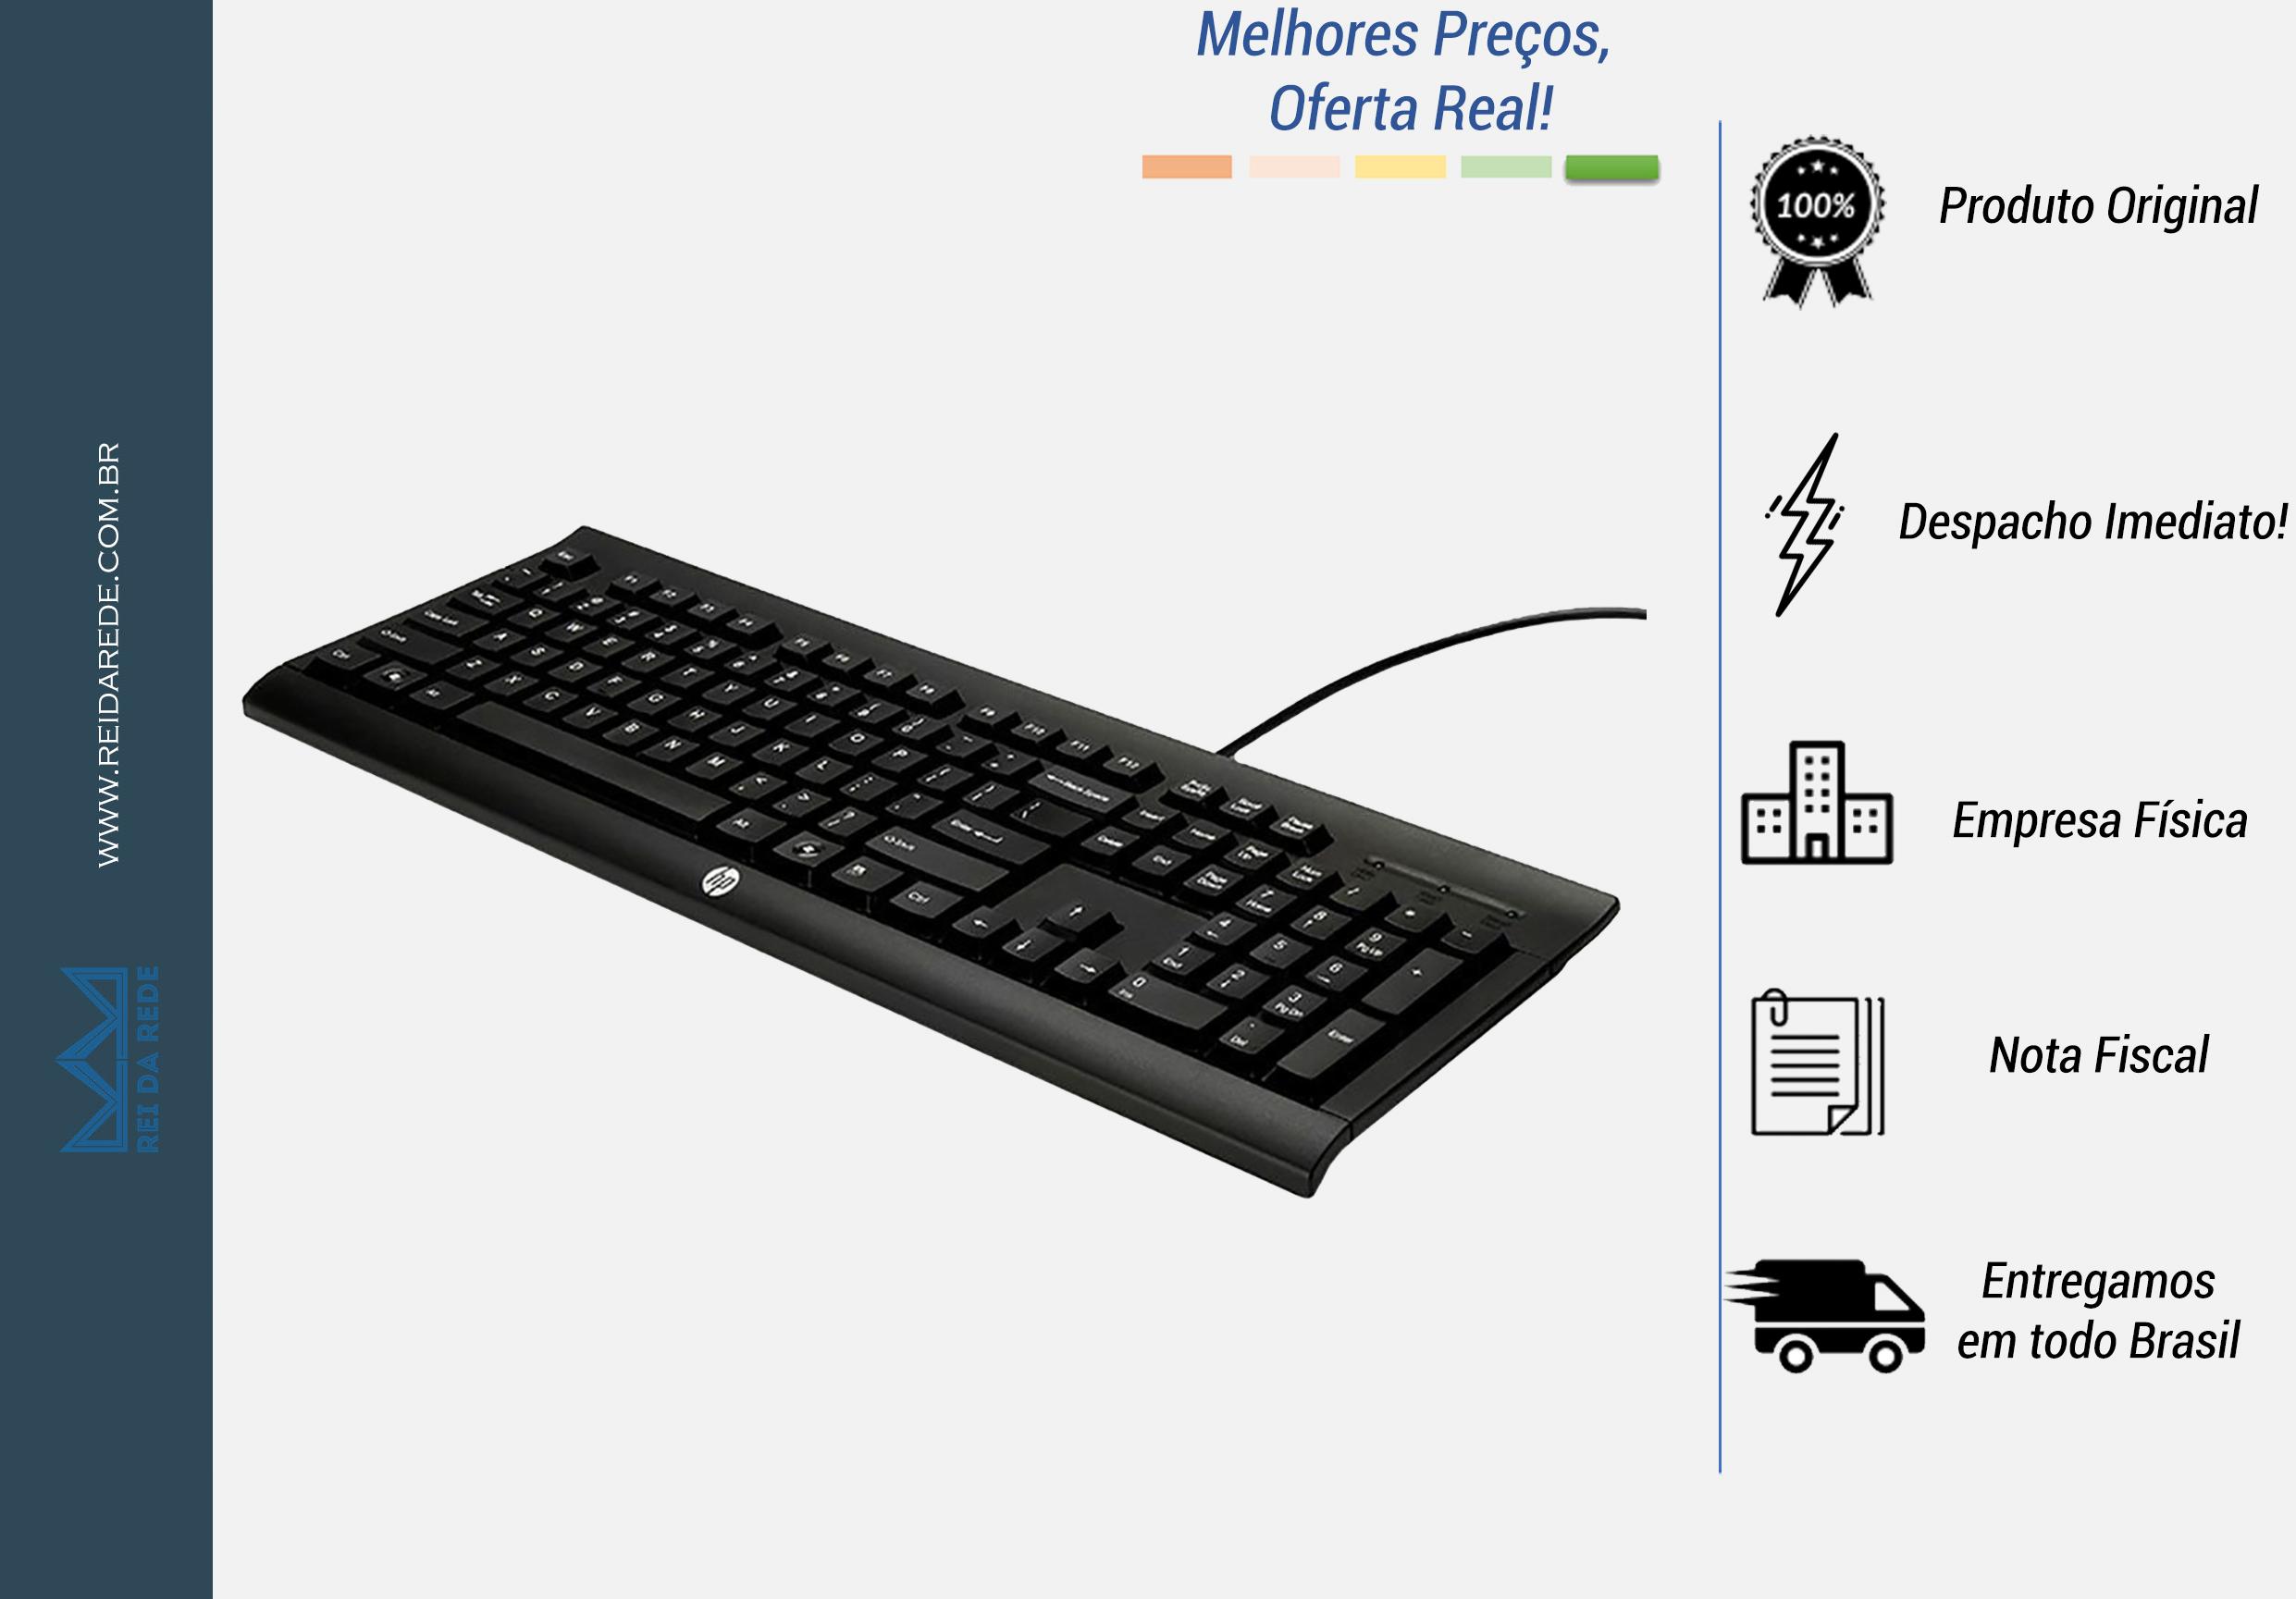 Teclado HP USB K1500 Multimídia Preto